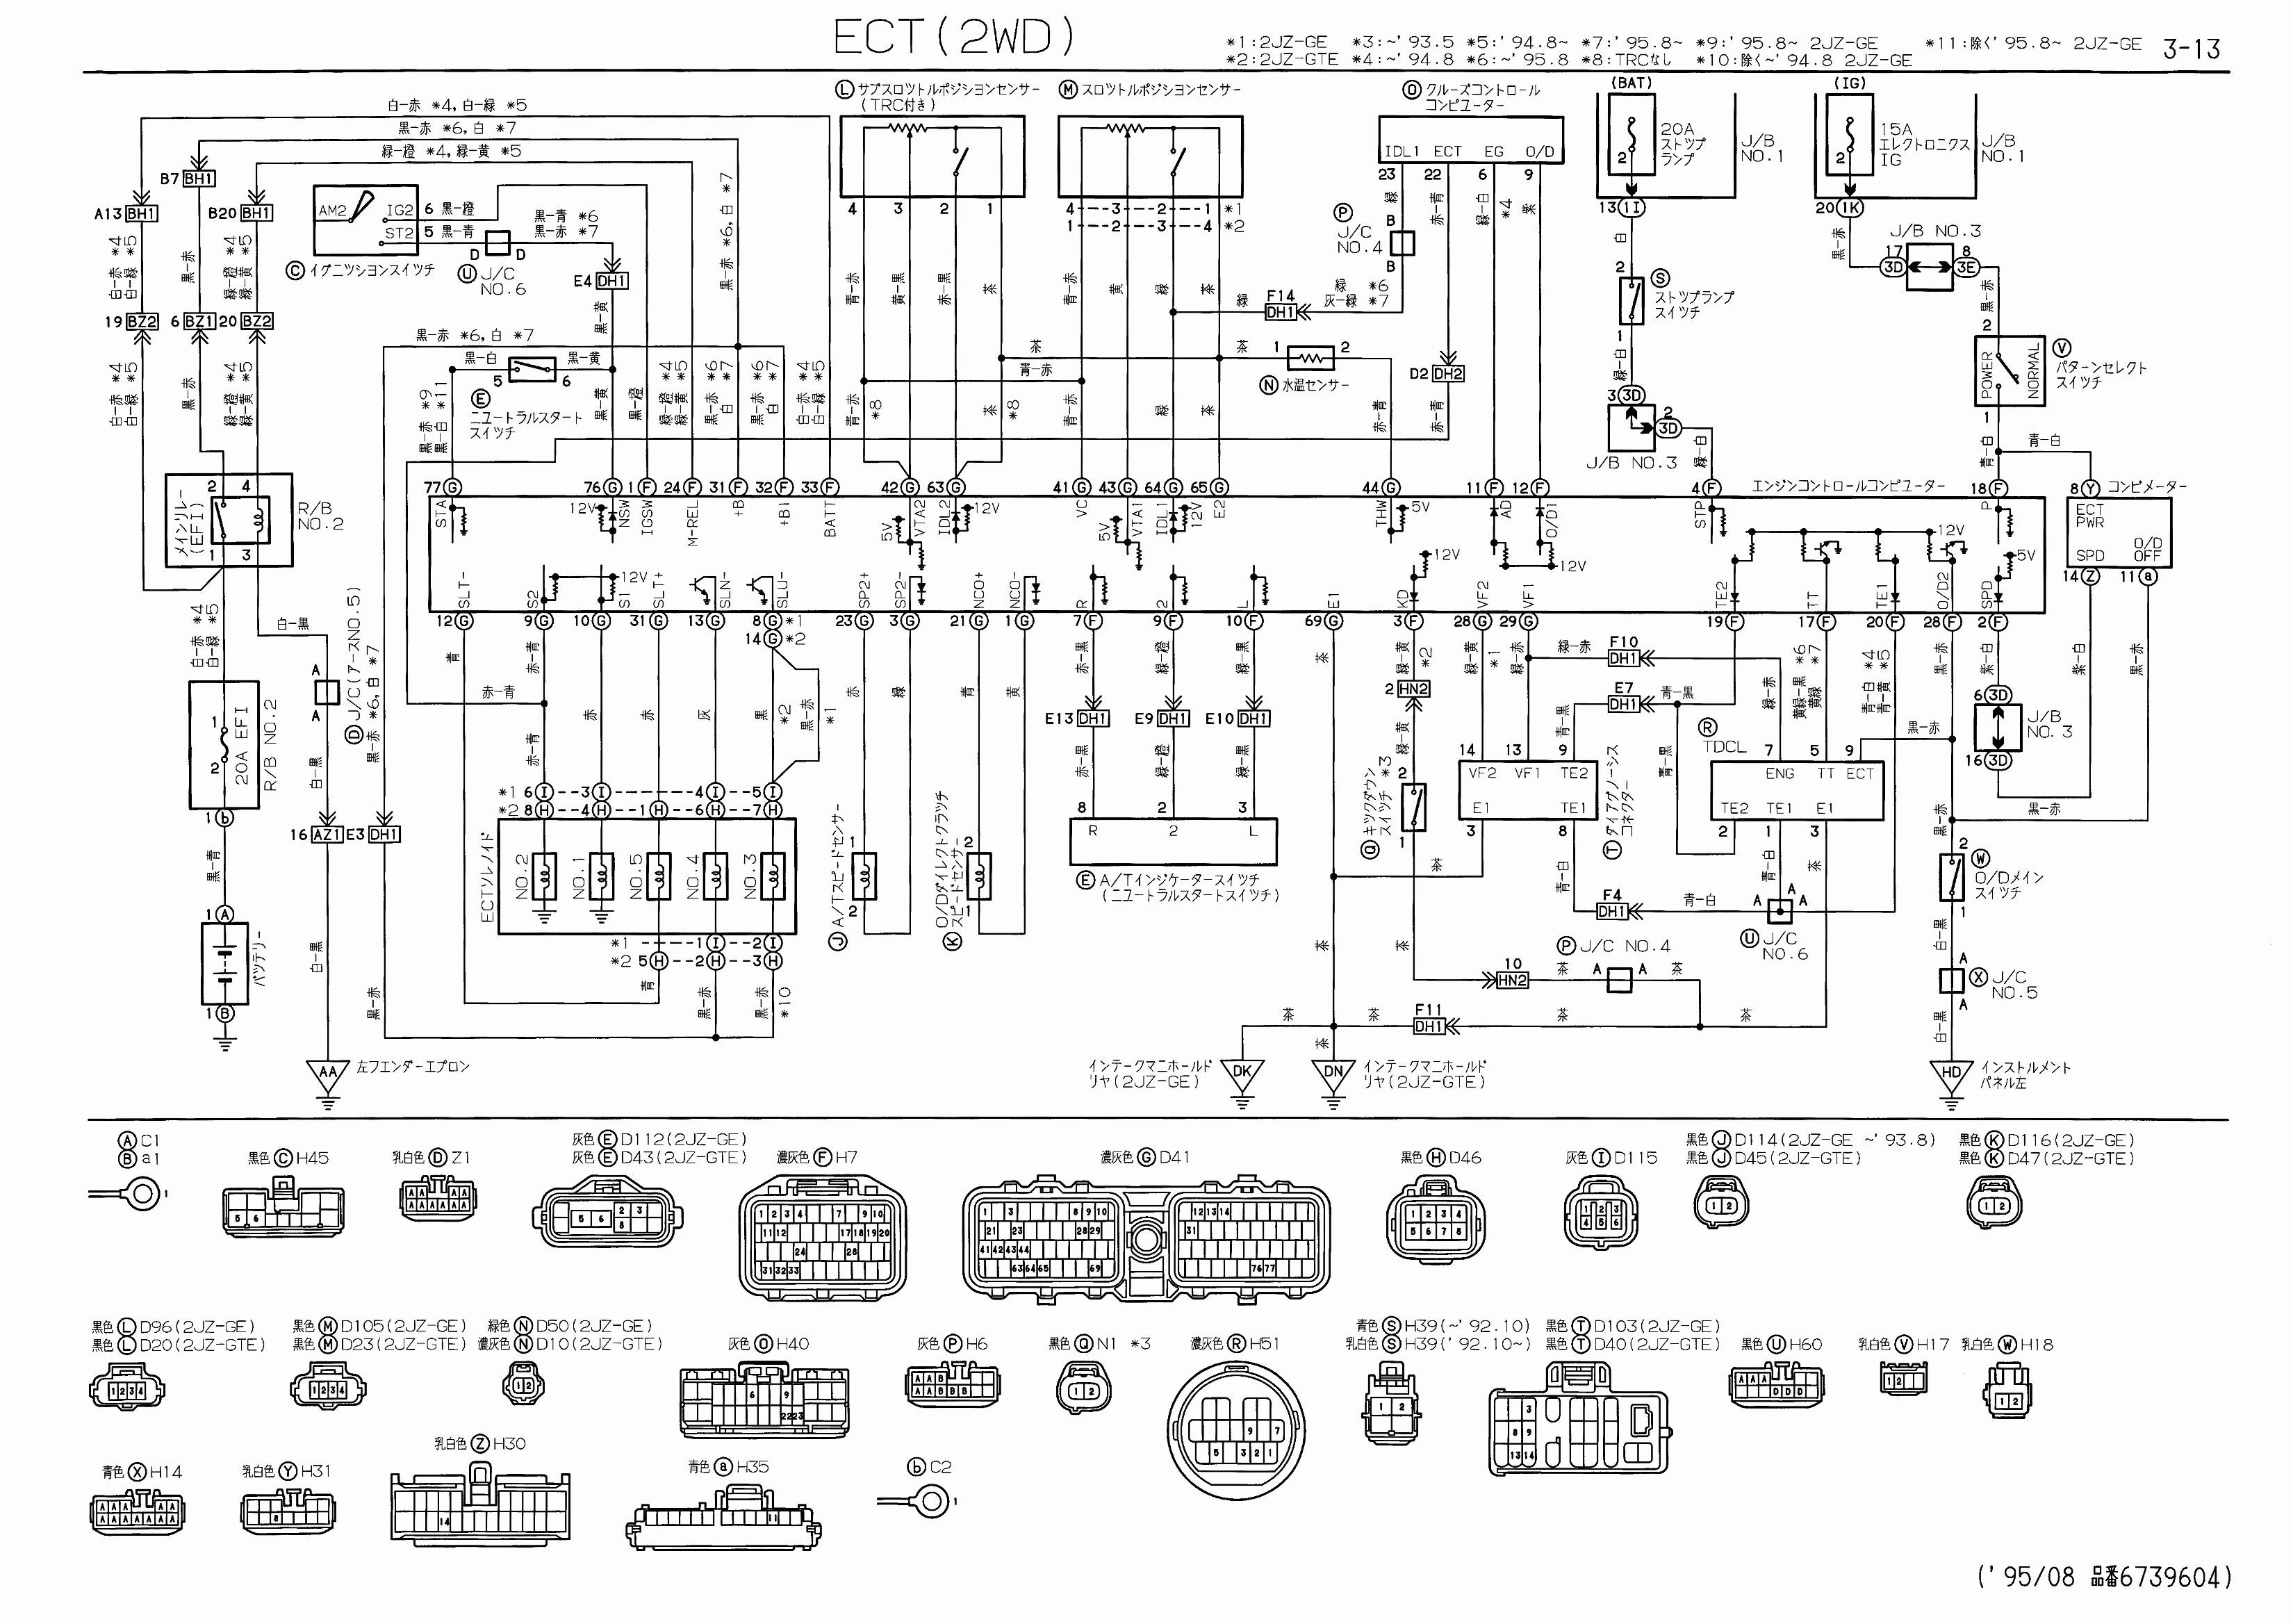 92 Infiniti Q45 Fuse Box | Wiring Diagram on